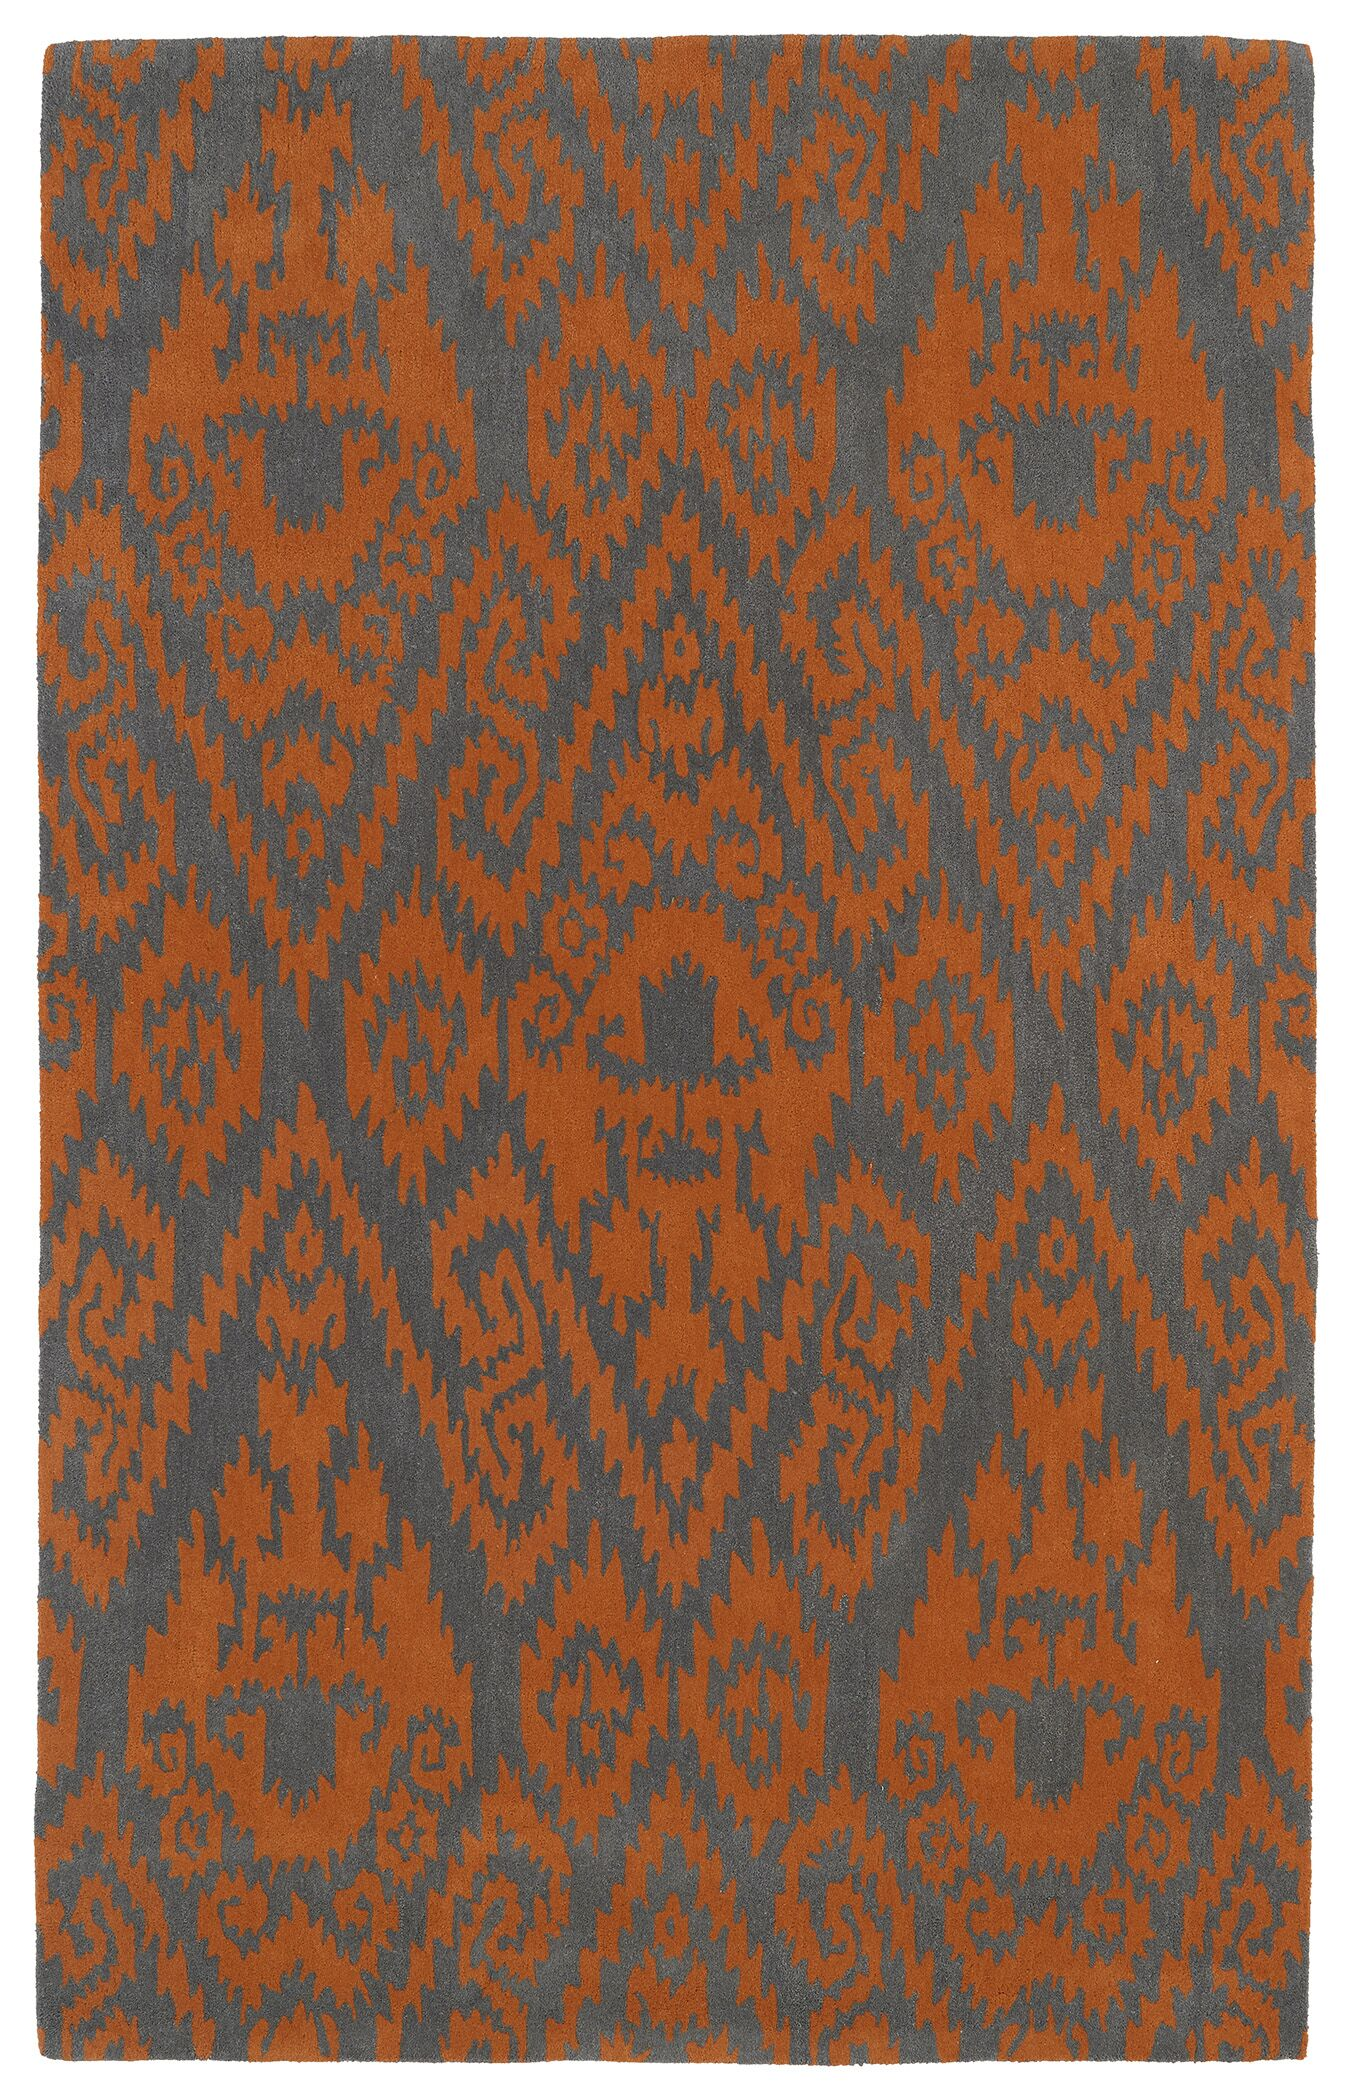 Rodeo Orange Area Rug Rug Size: Rectangle 9'6